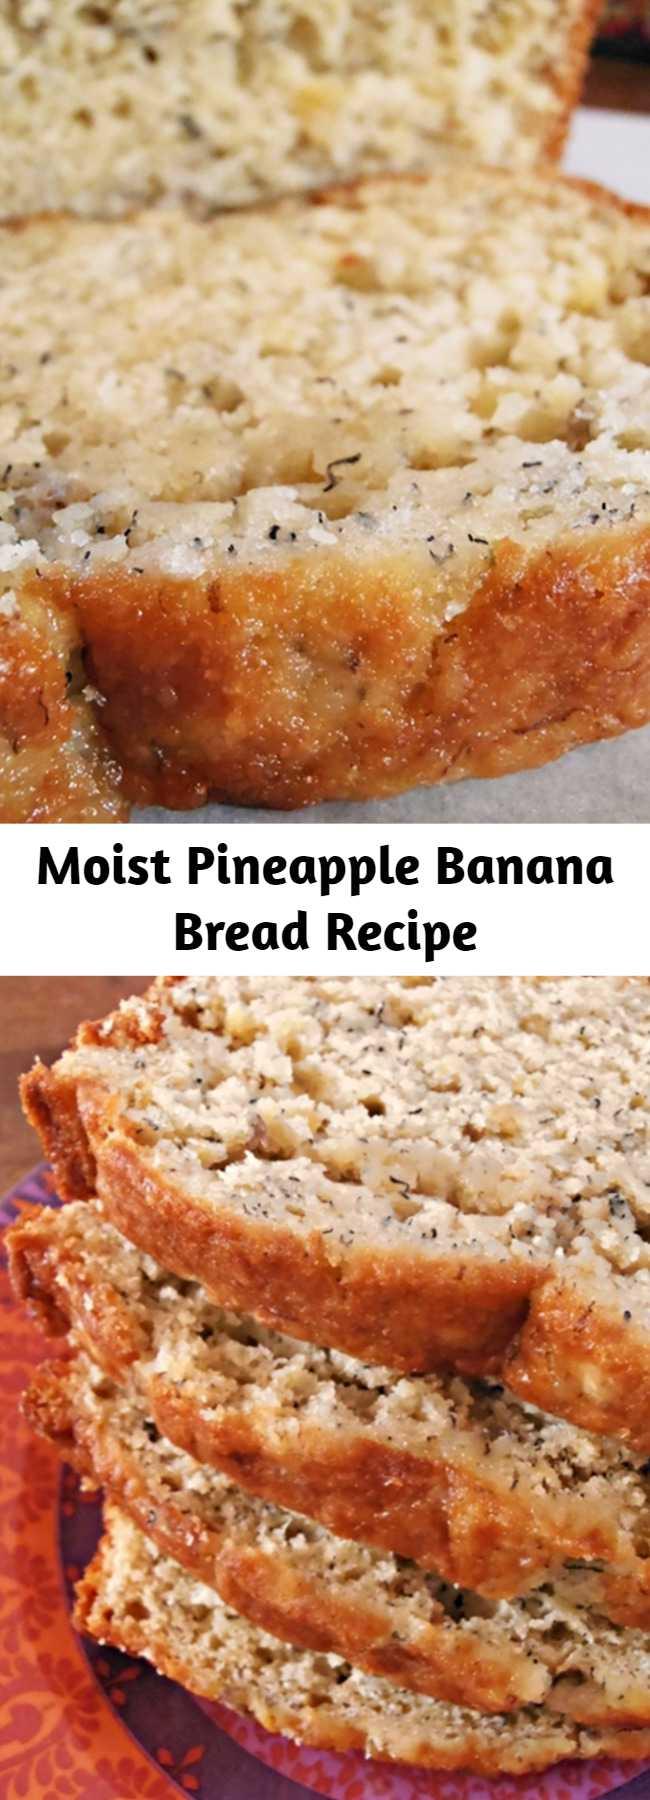 Moist Pineapple Banana Bread Recipe - Moist Pineapple Banana Bread takes a tropical twist on classic banana bread, using crushed pineapple and coconut.